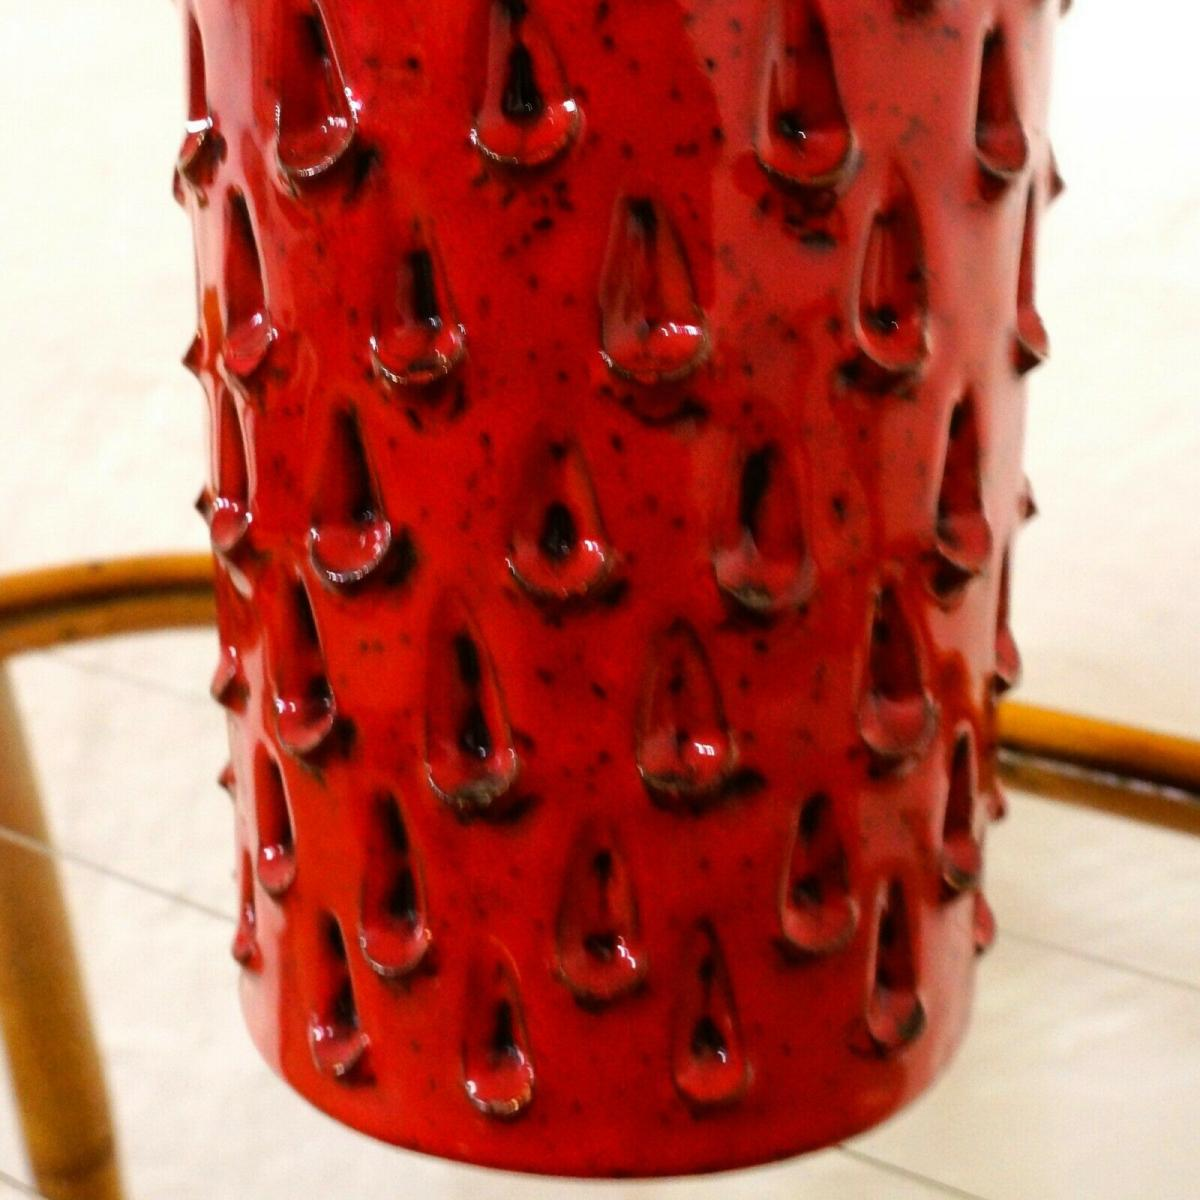 Röhrenvase Vase Erdbeer FRATELLI FANCIULLACCI Alla Moda 411/A Rot 60er Jahre 8